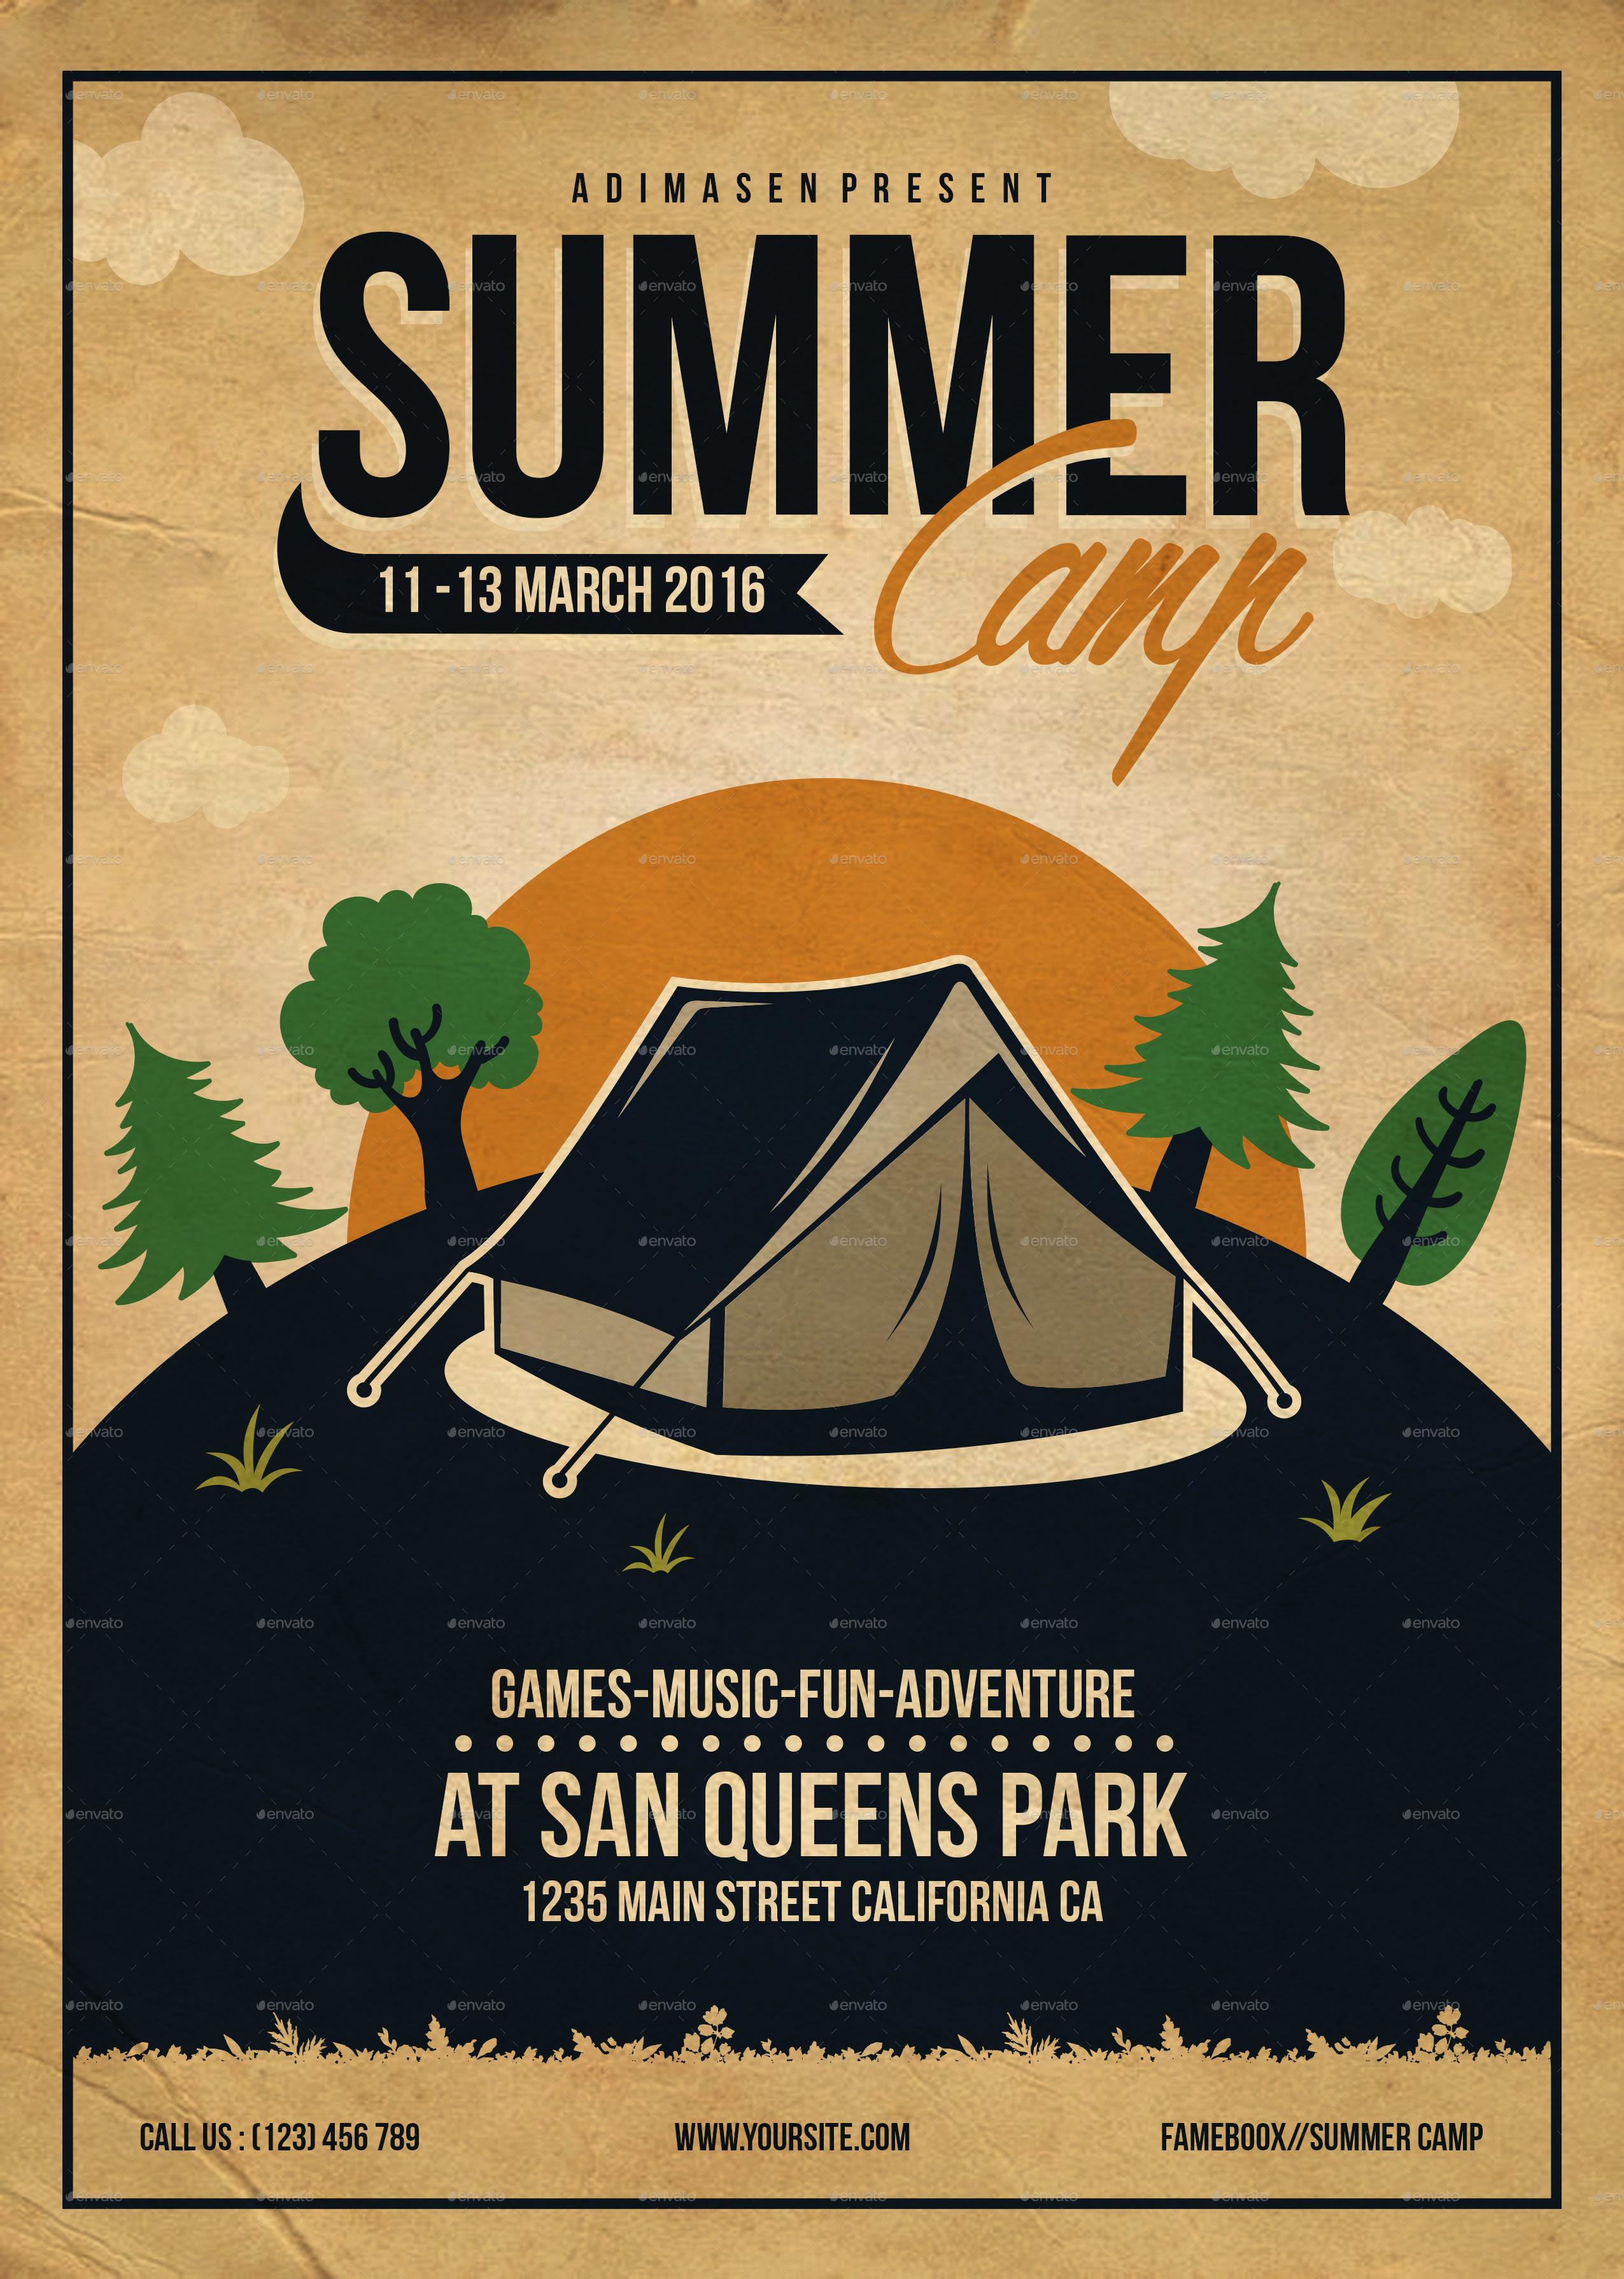 Summer Camp Flyer Template by adimasen – Camp Flyer Template